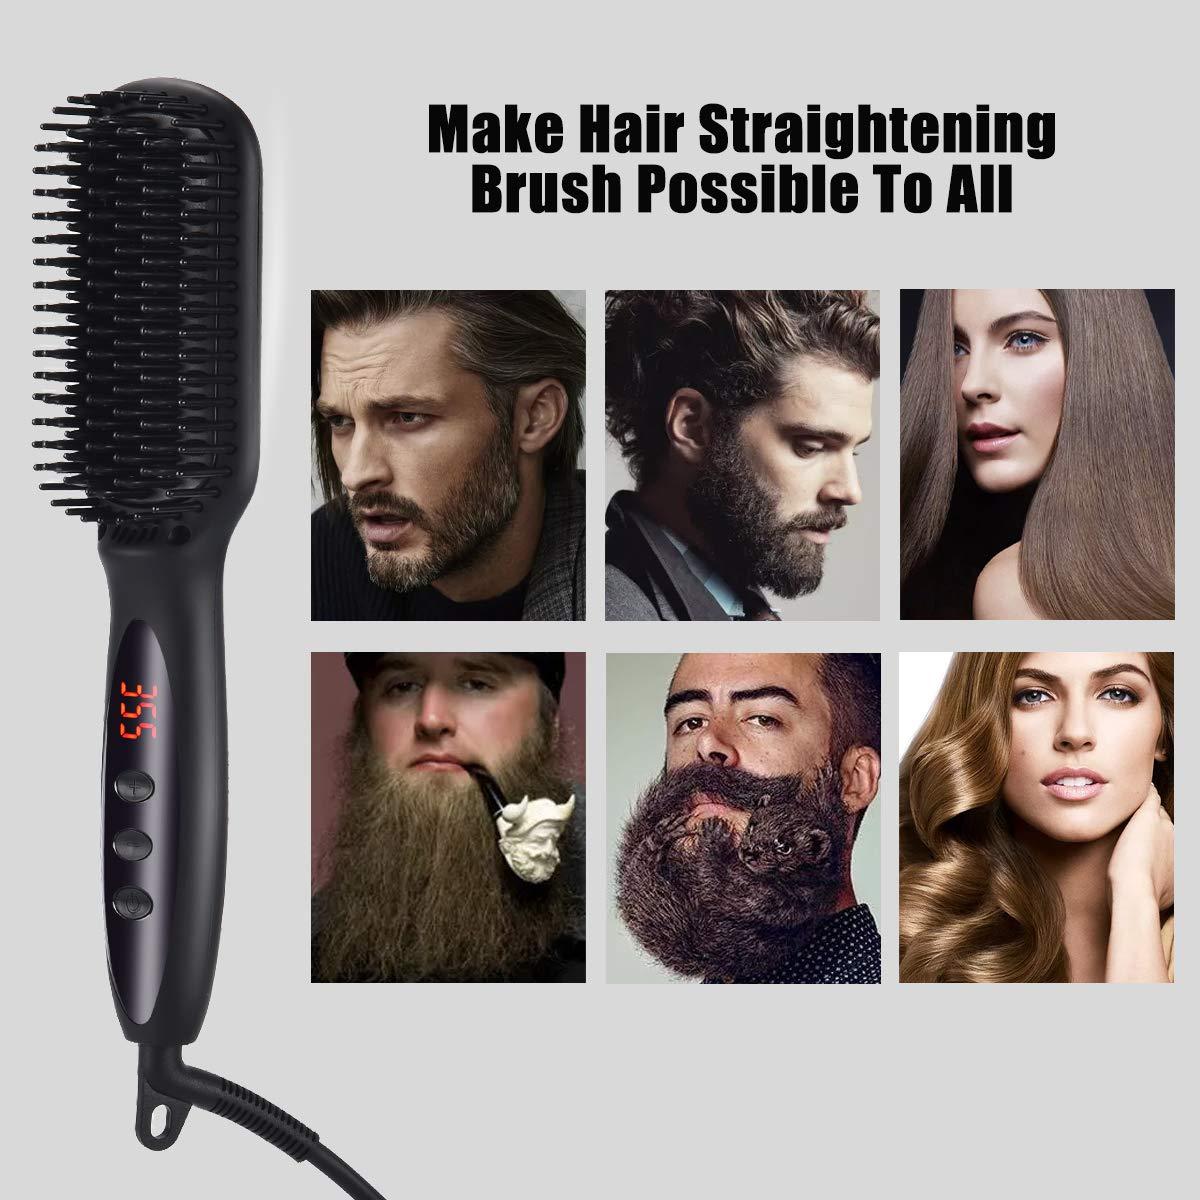 Beard Straightener for Men, WLWQ Beard Straightening Heat Brush LCD Display Adjustable Temperature Anti-Scald Hair Straightener Beard Comb for Home and Travel